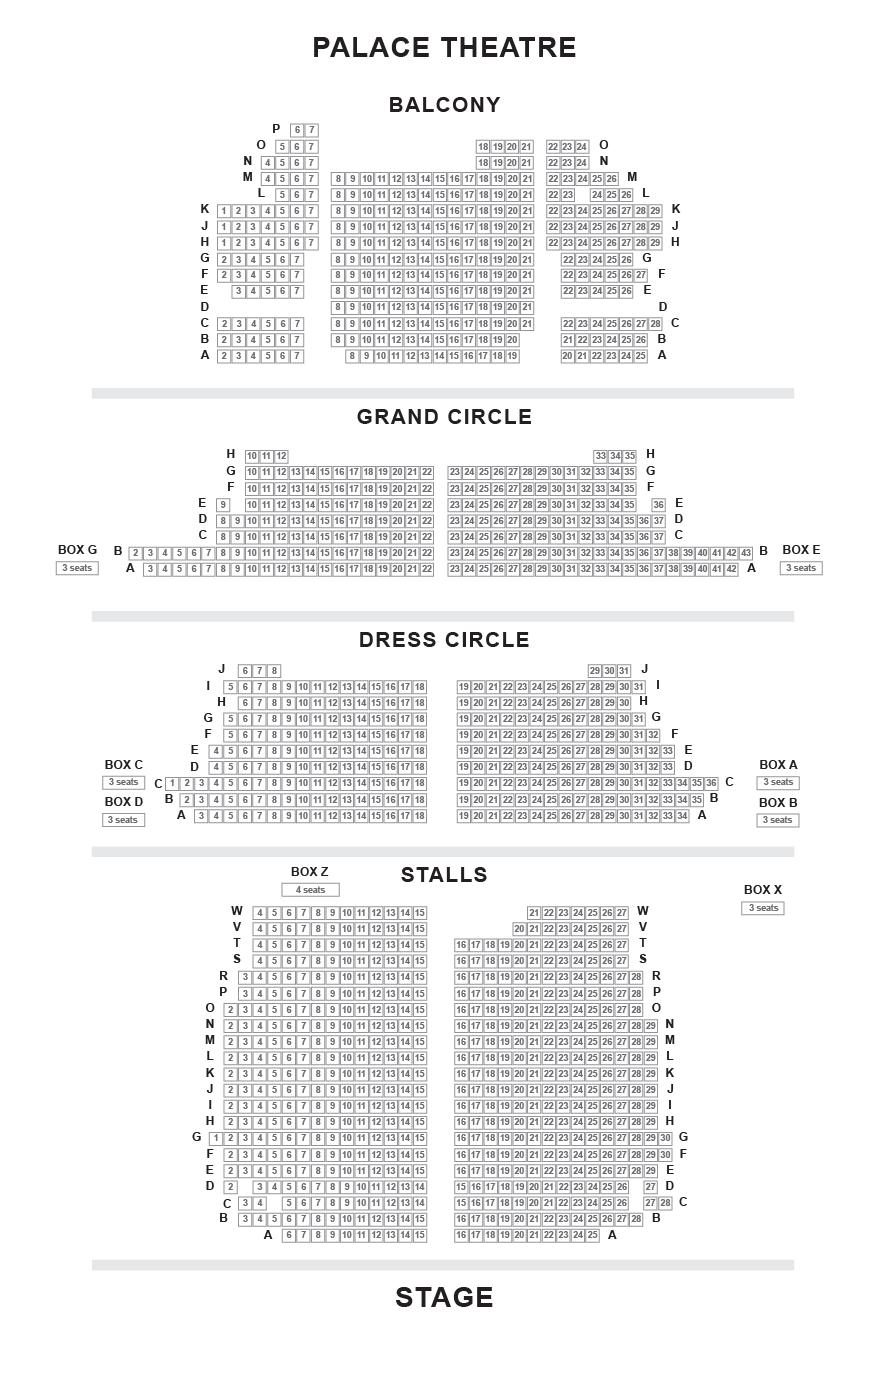 Palace Theatre Seating Plan